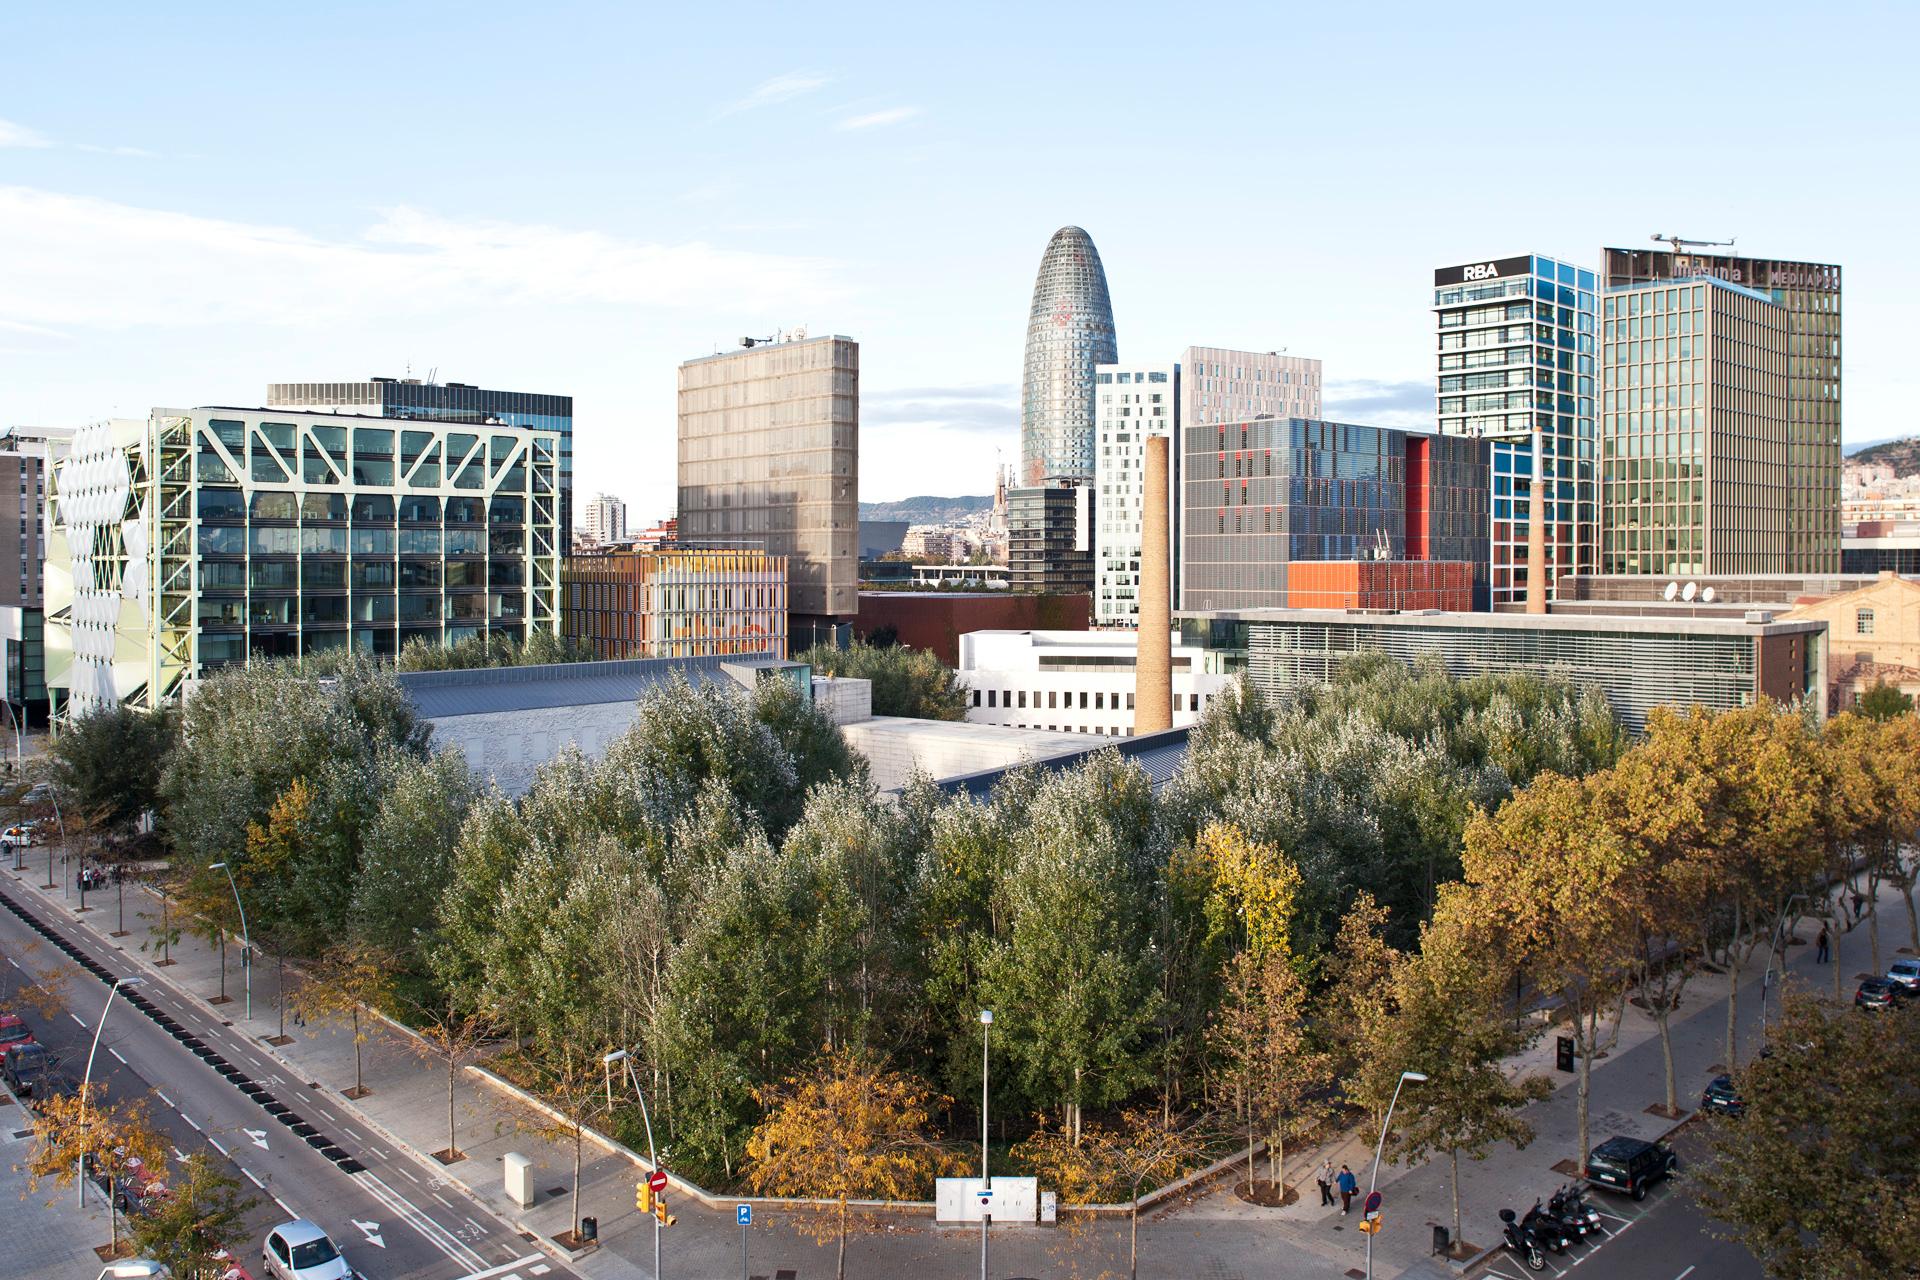 La llave de oro vende a catalana occidente un edificio en for Catalana occidente oficinas